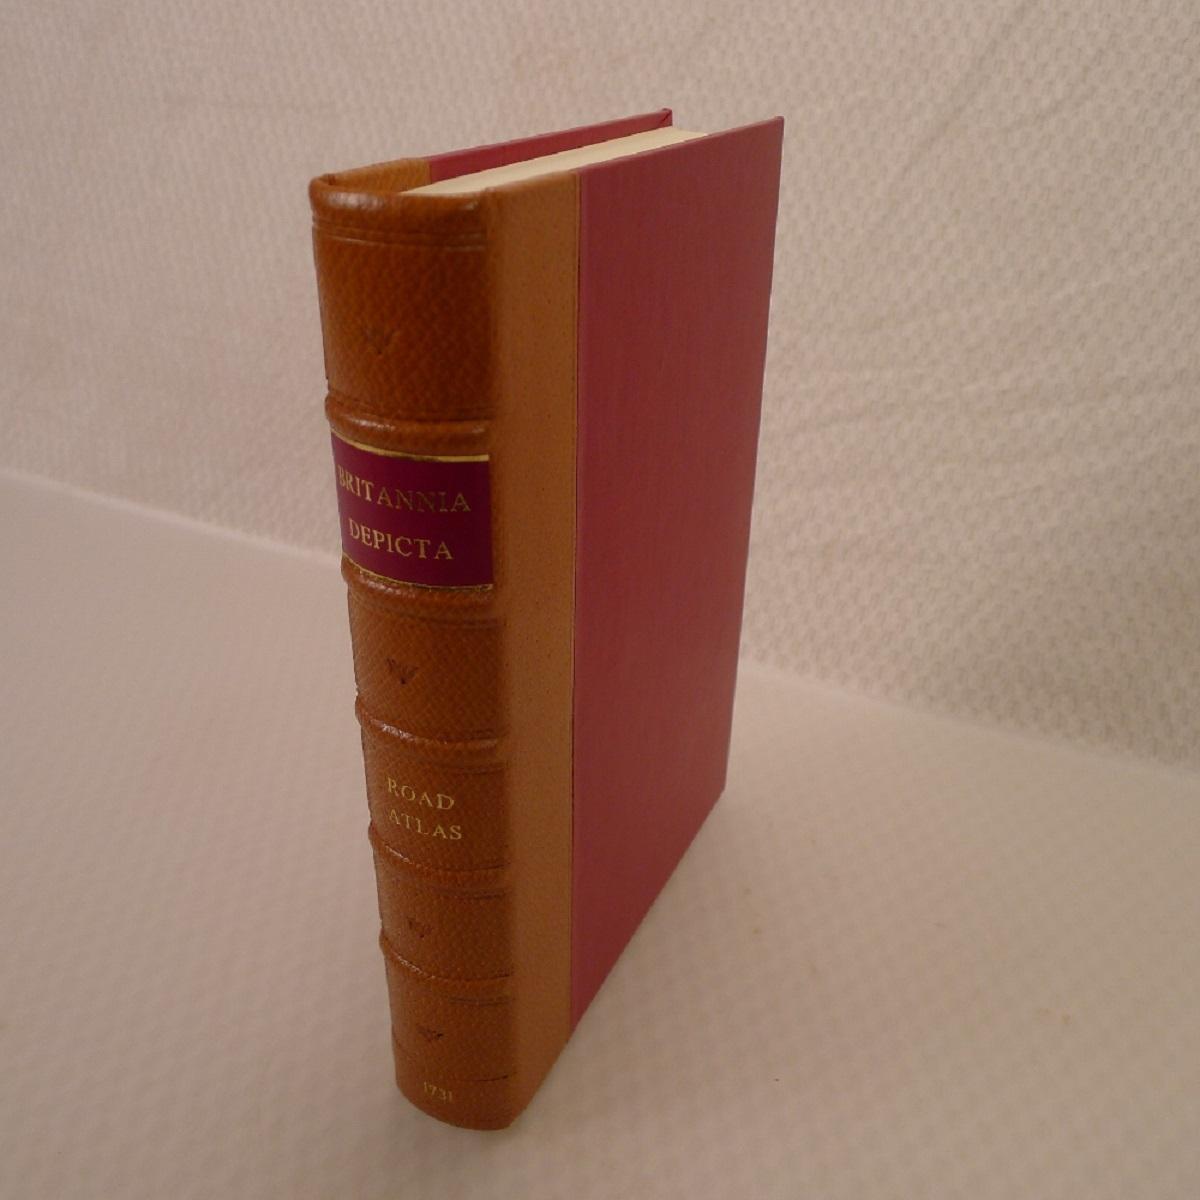 A facsimile reprint of Britannia Depicta 1731 by Emmanuel Bowen published by Britannia